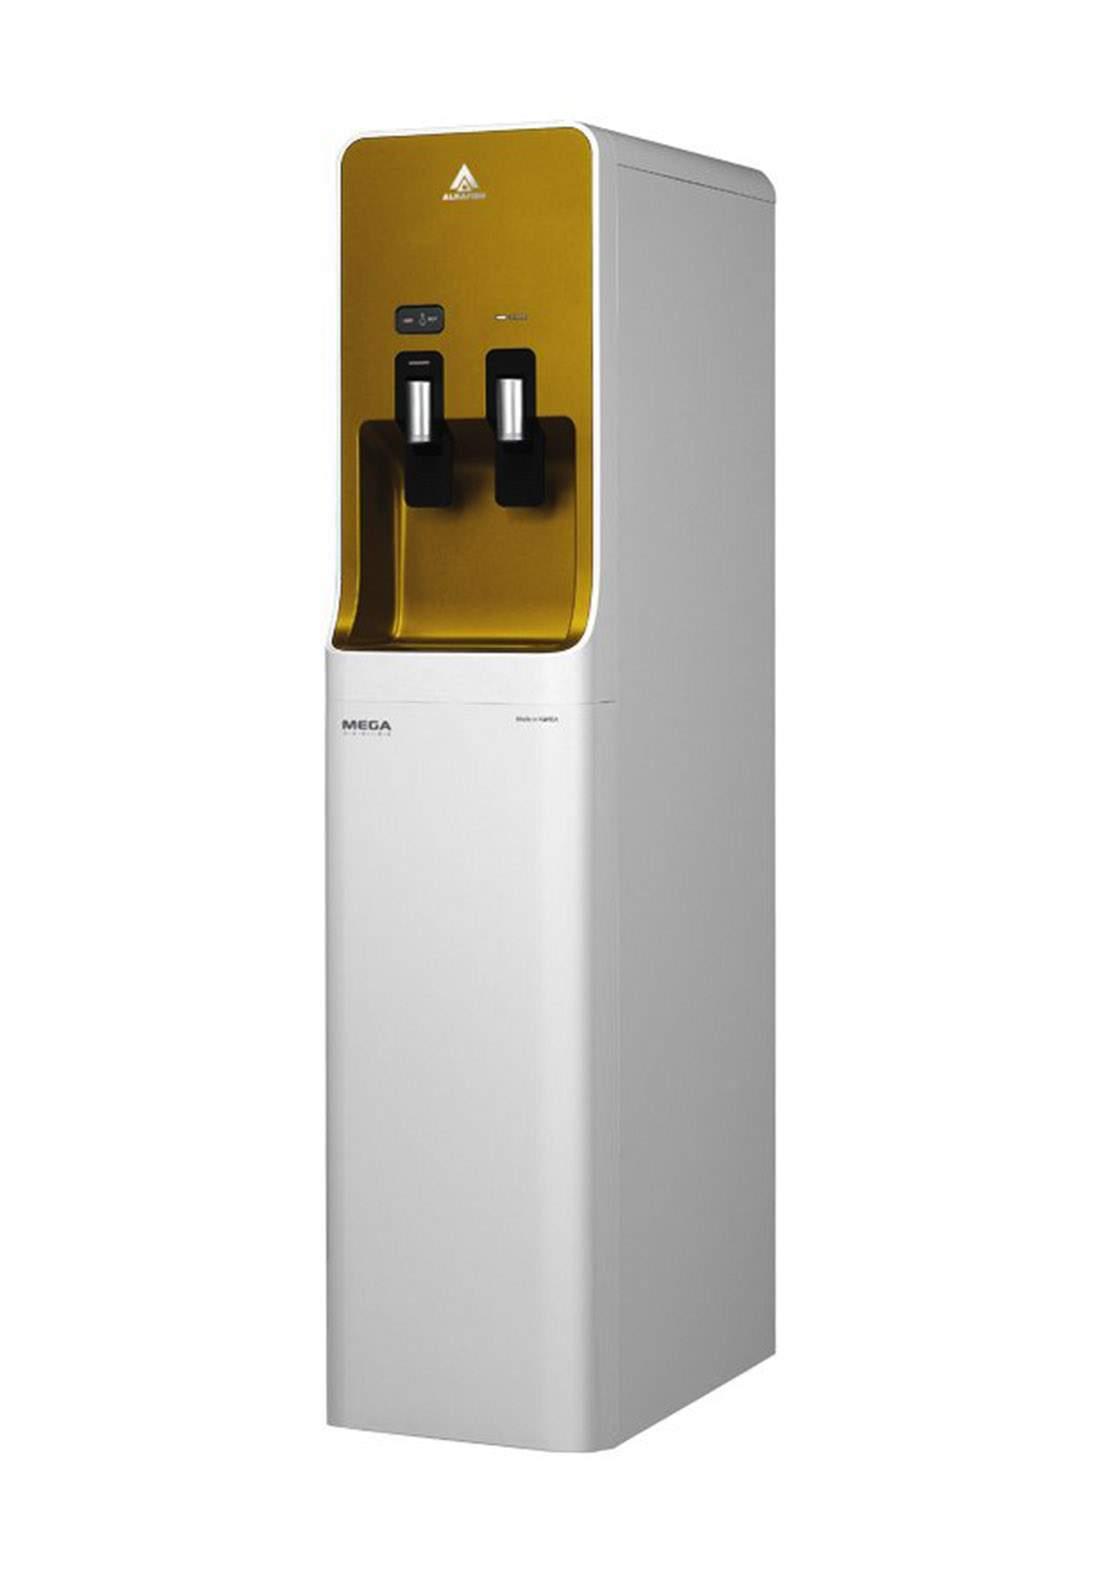 Alhafidh (DHA-880KWG) Free Standing Super Slim Water Dispenser براد ماء عمودي